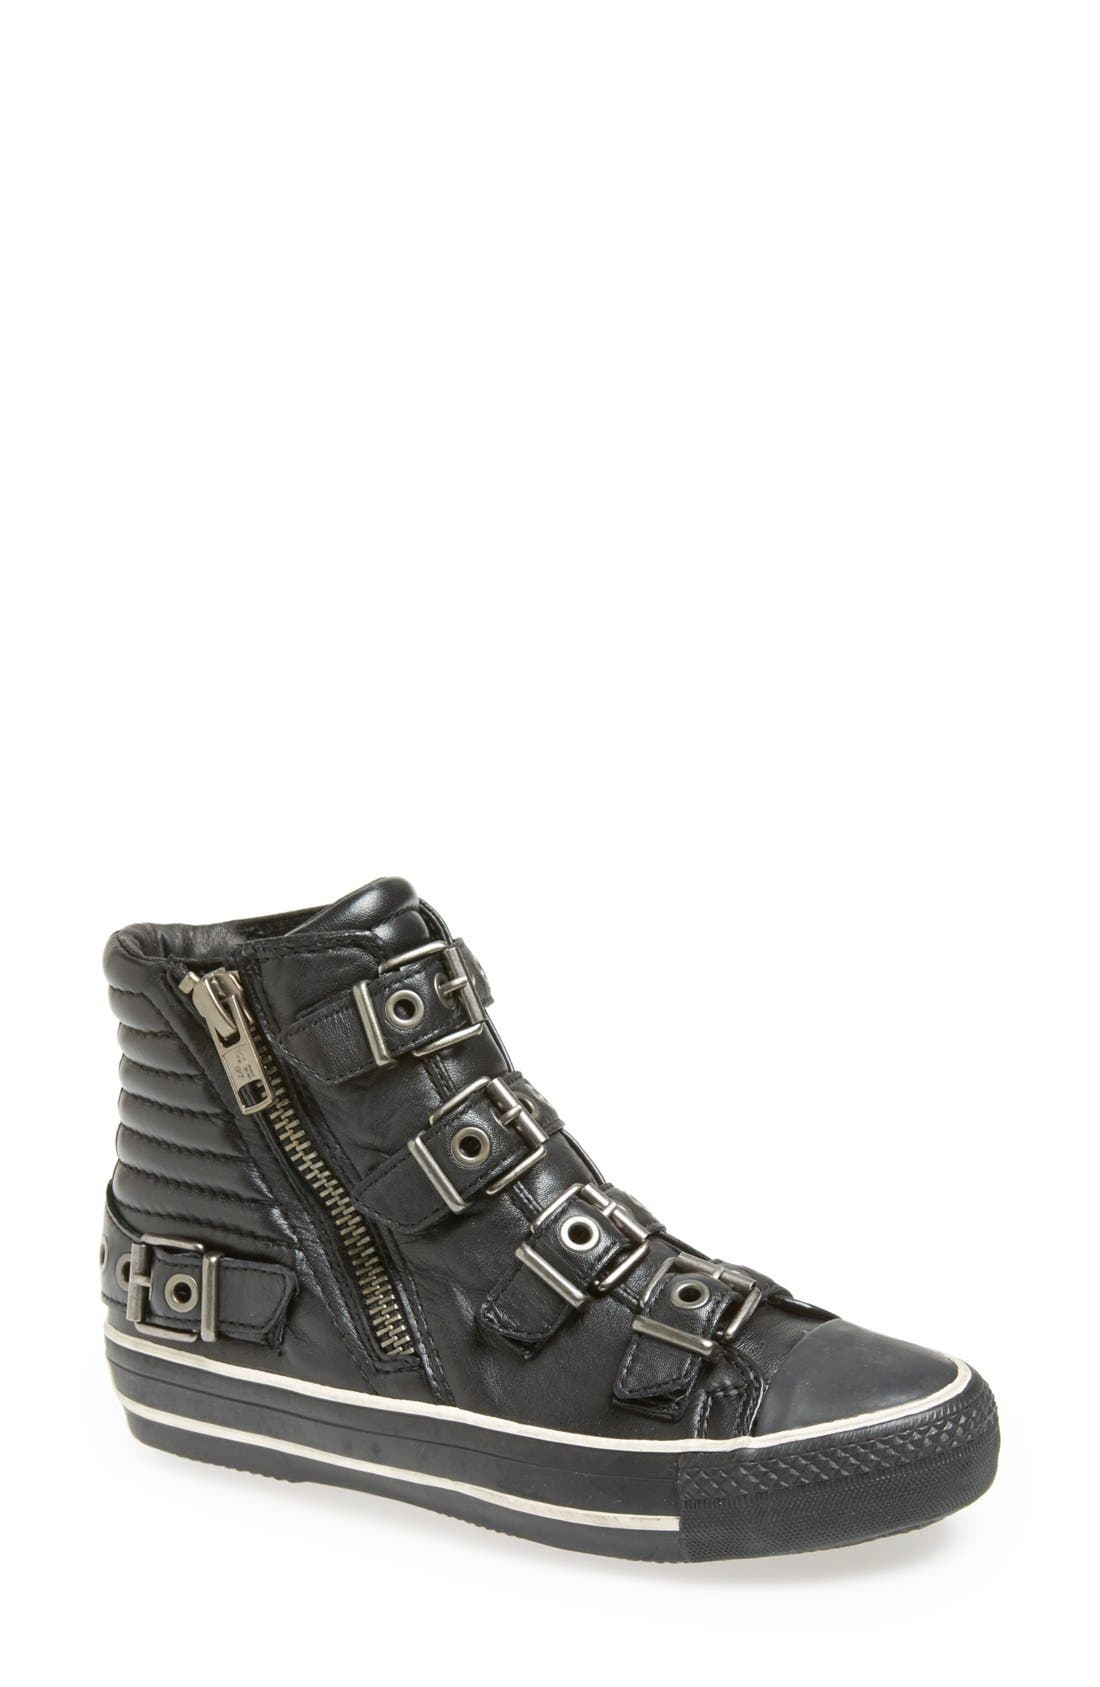 Main Image - Ash 'Vangelis' High Top Sneaker (Women)